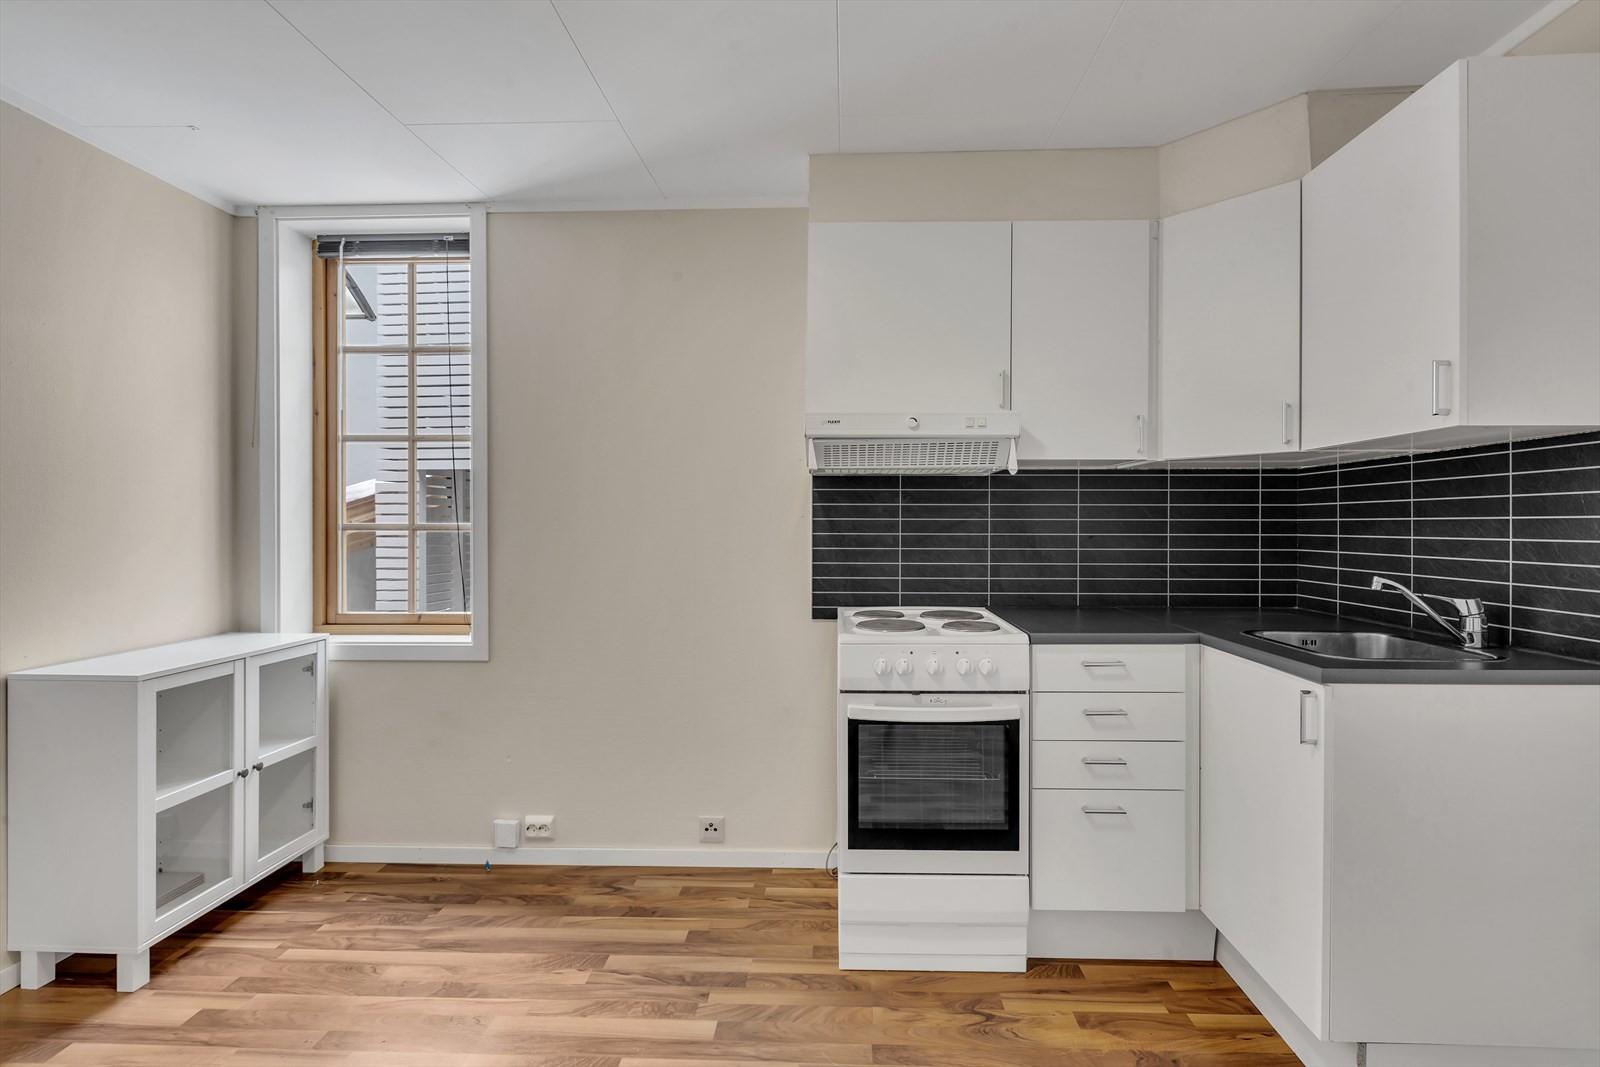 hjørnekjøkken med lyse fronter og kitchenboard bak benk.